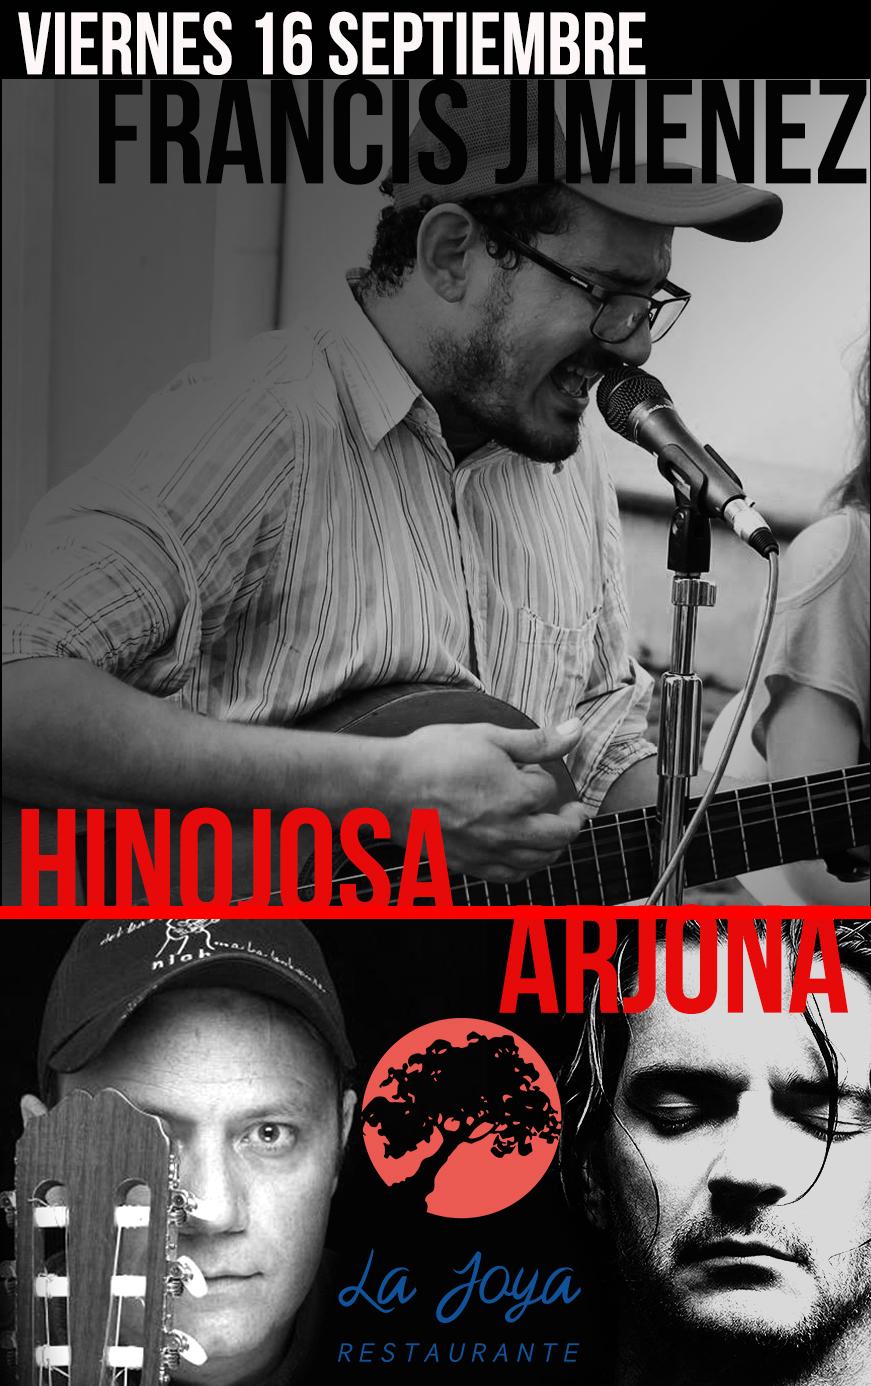 ESPECIAL DE ARJONA / HINOJOSA